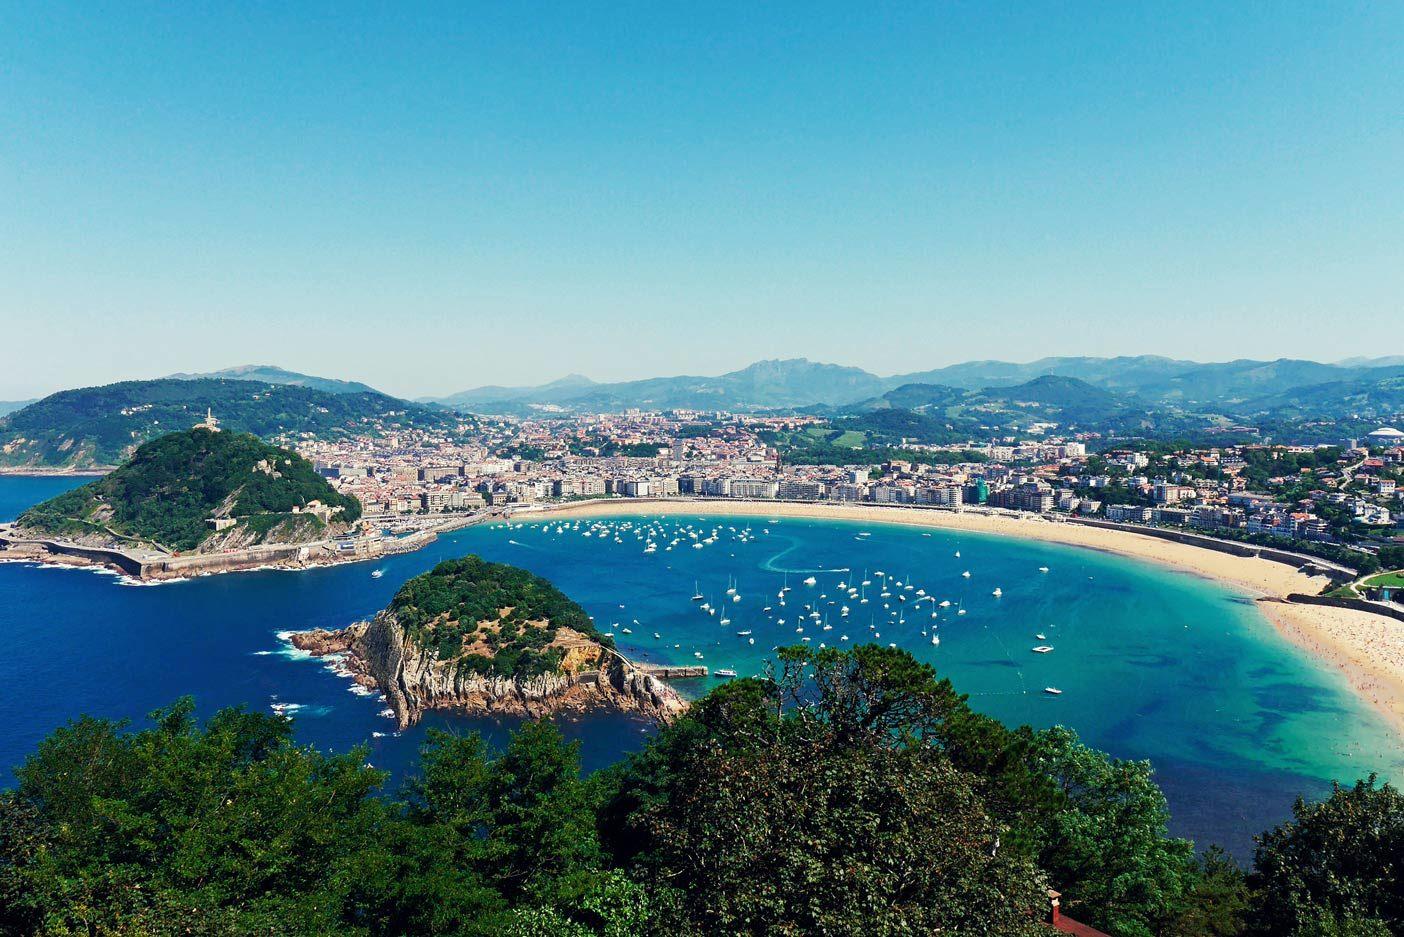 la_concha_beach_donostia-san_sebastian_spanyolorszag.jpg